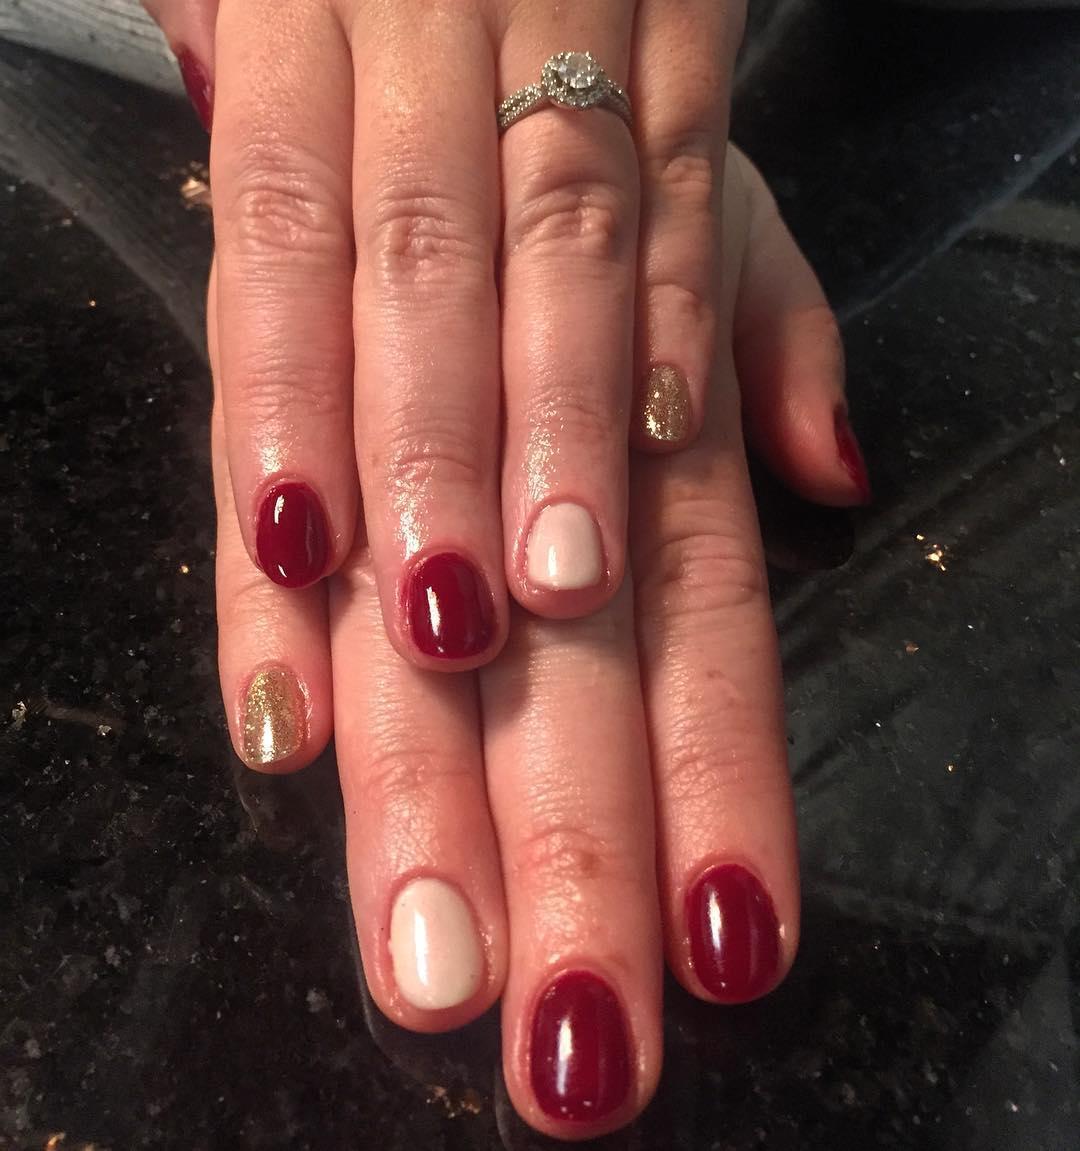 smashing glitter nail polish designs and ideas 2019 25 - Smashing Glitter Nail Polish Designs and Ideas 2019